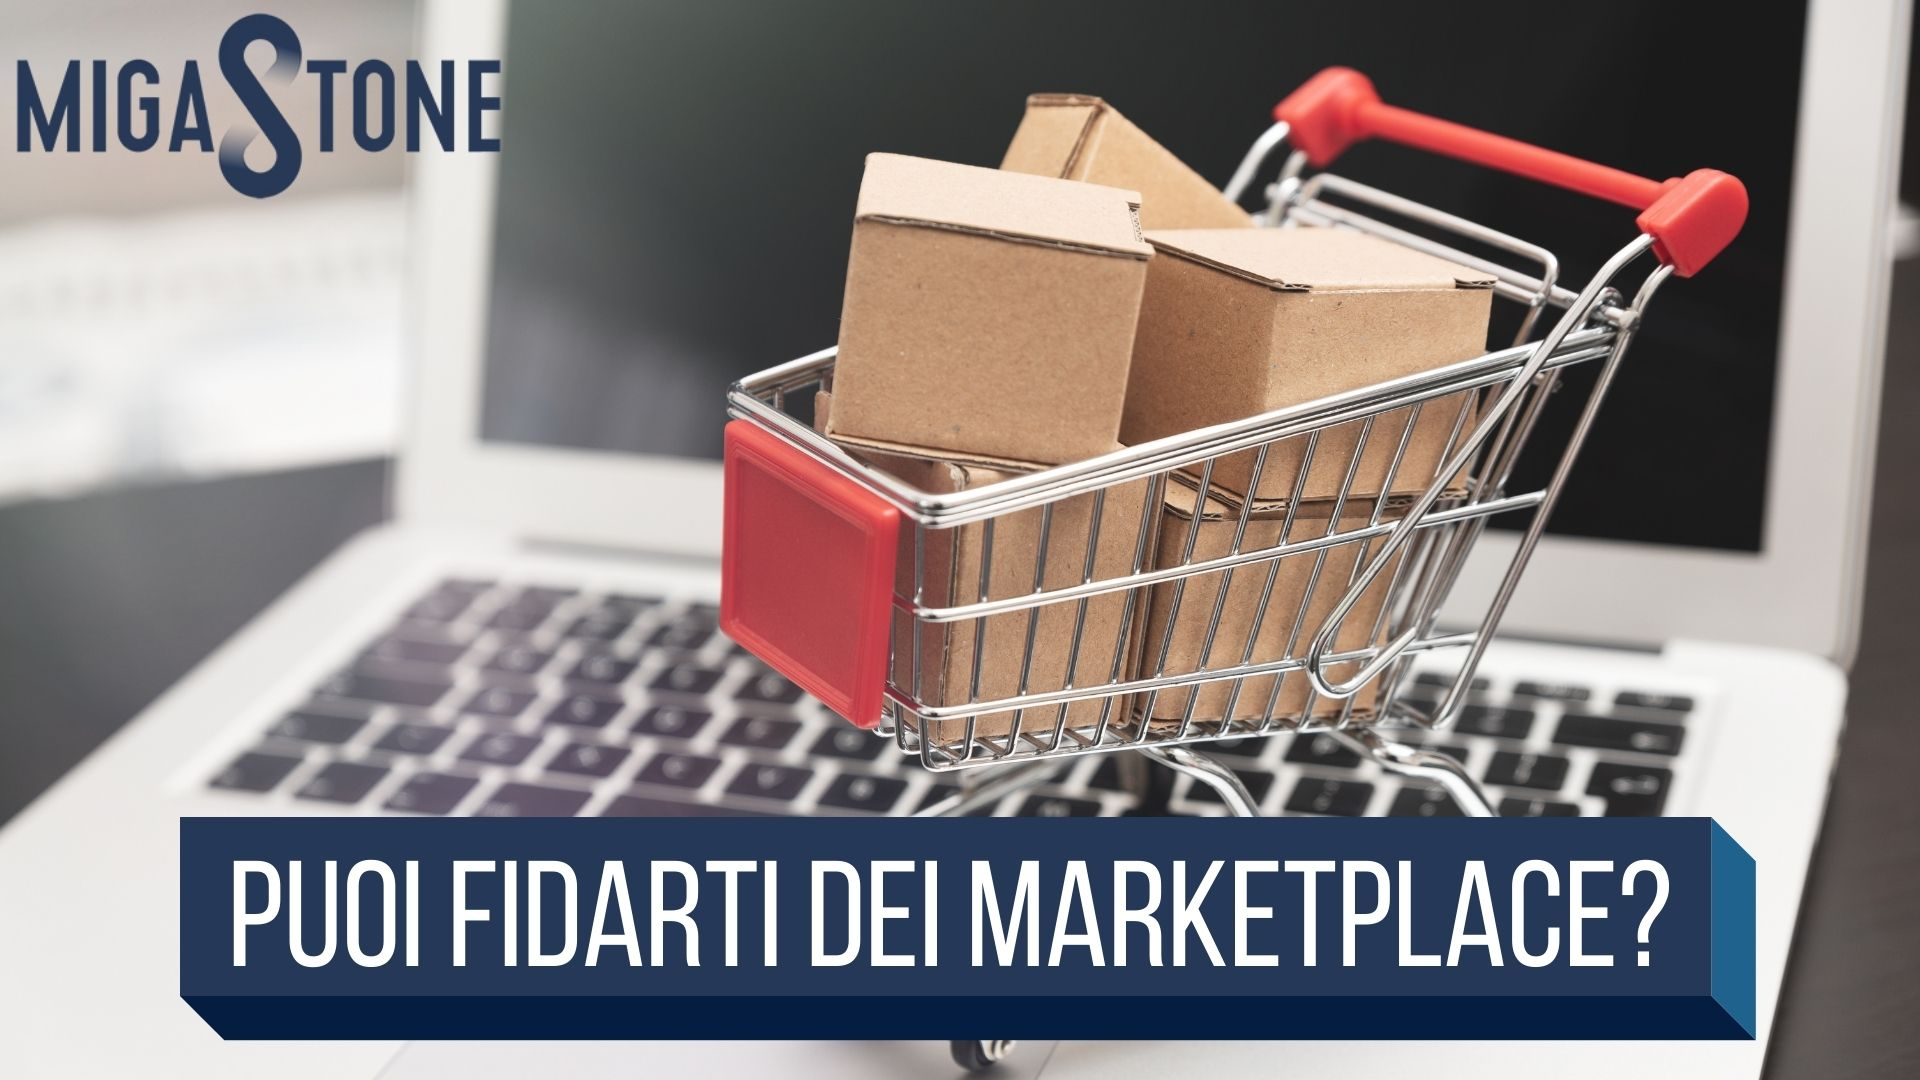 , Puoi fidarti dei Marketplace?, Migastone Blog